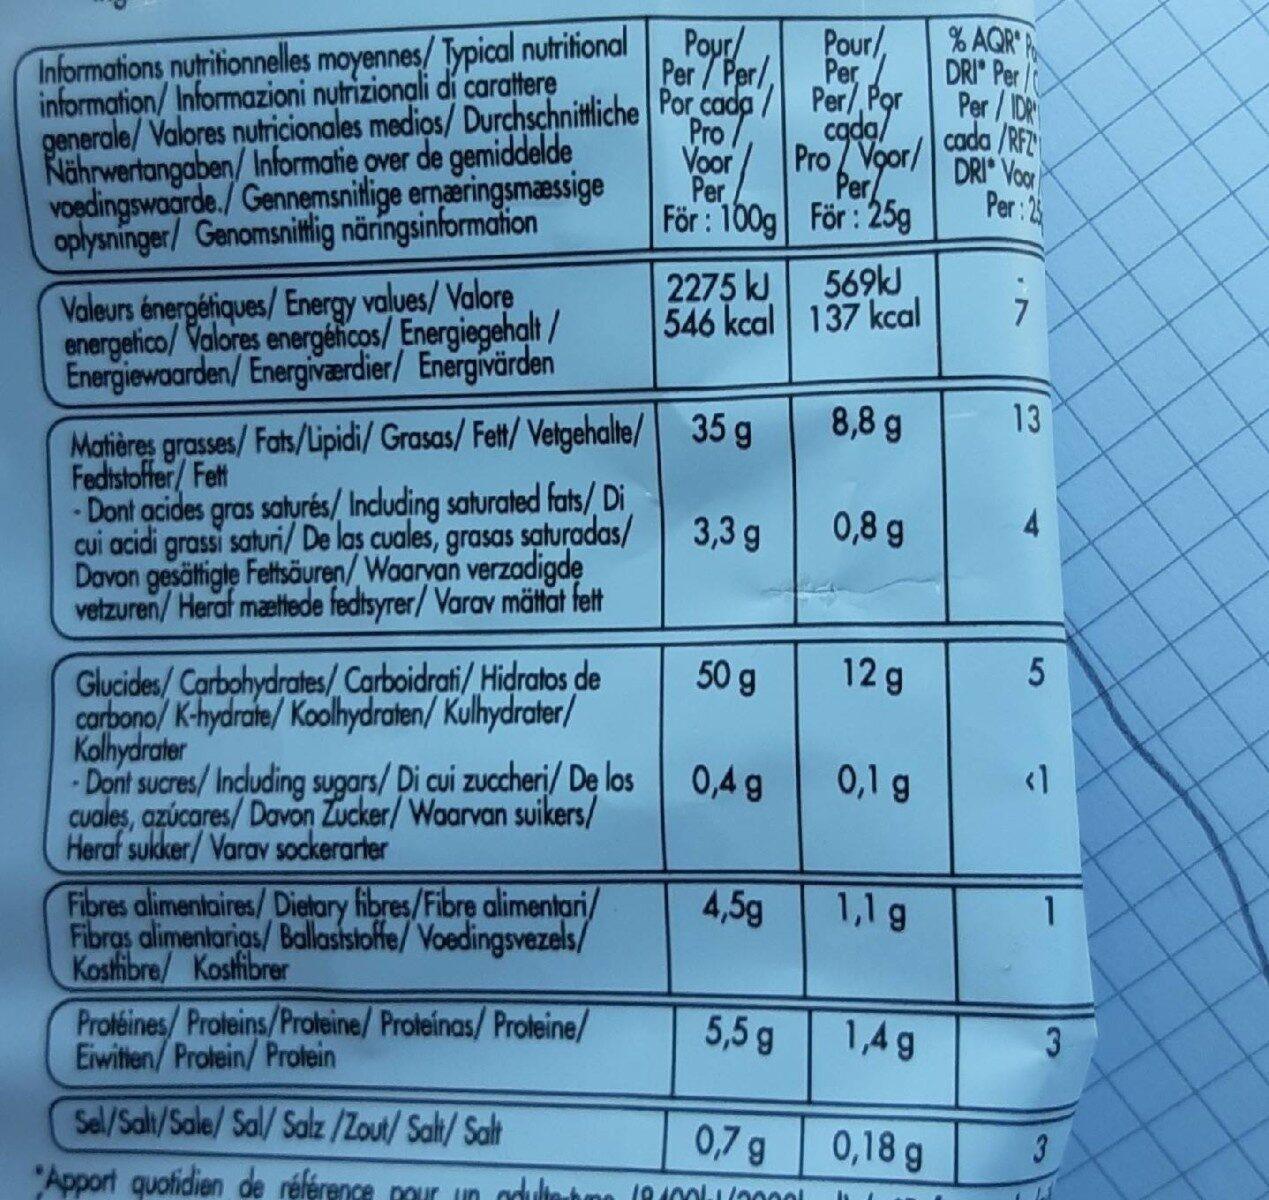 CHIPS BIO ONDULEE ALLEGEE EN SEL - Informations nutritionnelles - fr